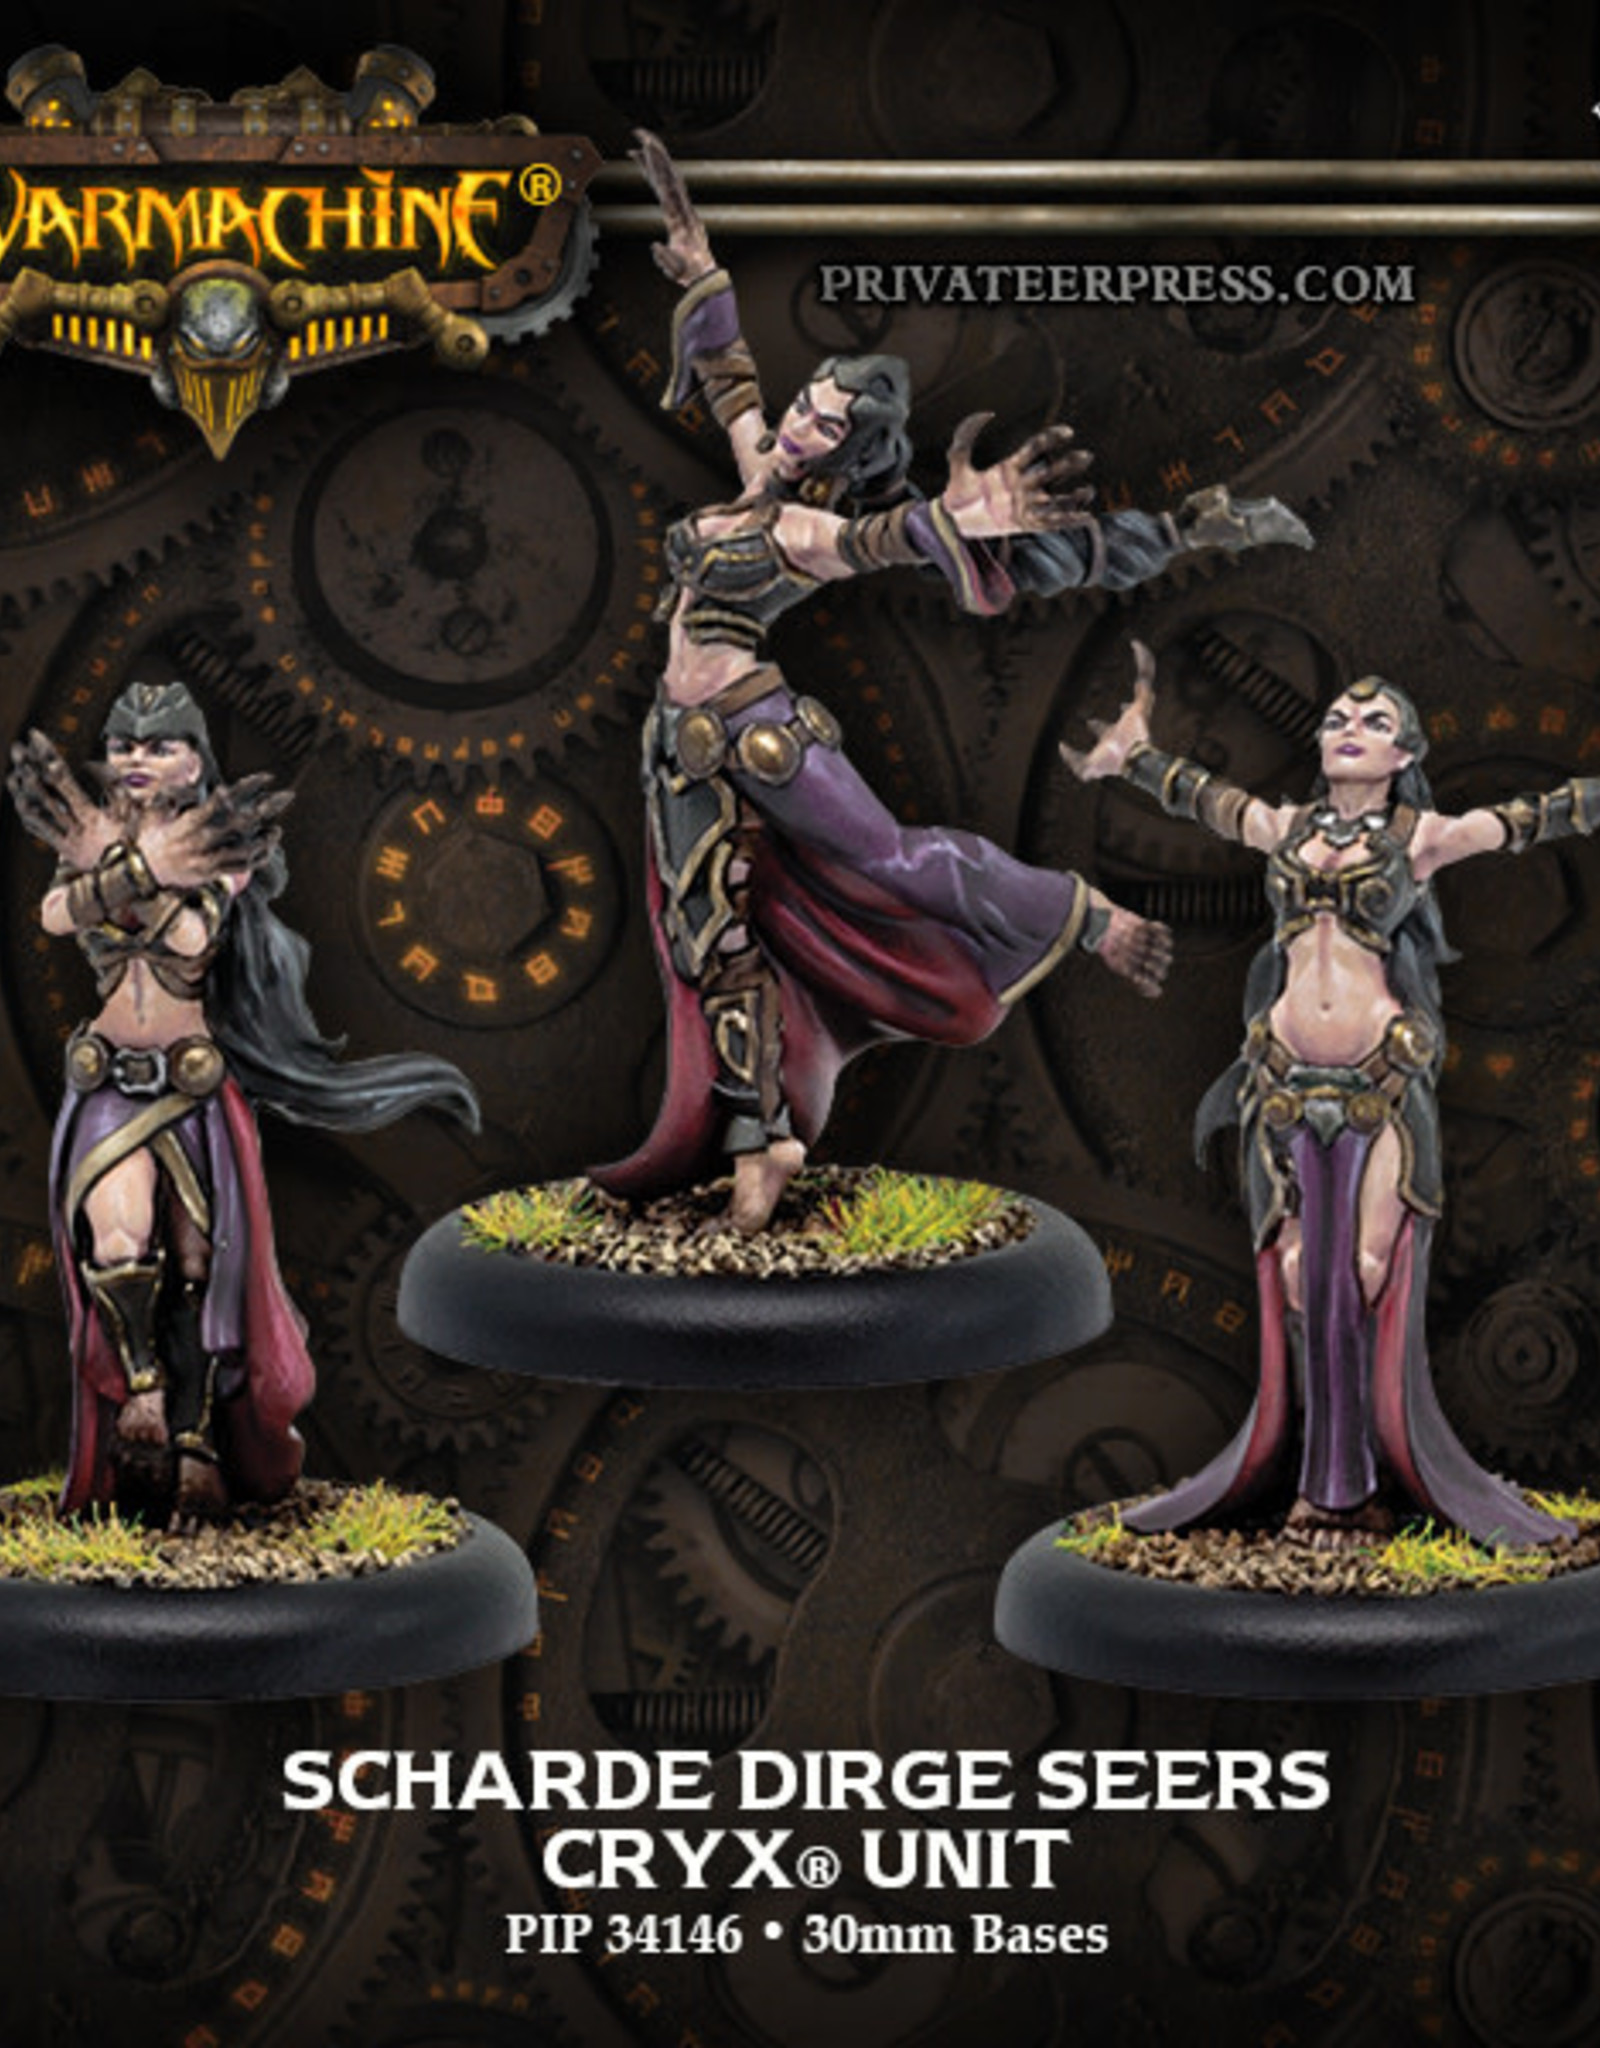 Warmachine Cryx - Scharde Dirge Seers